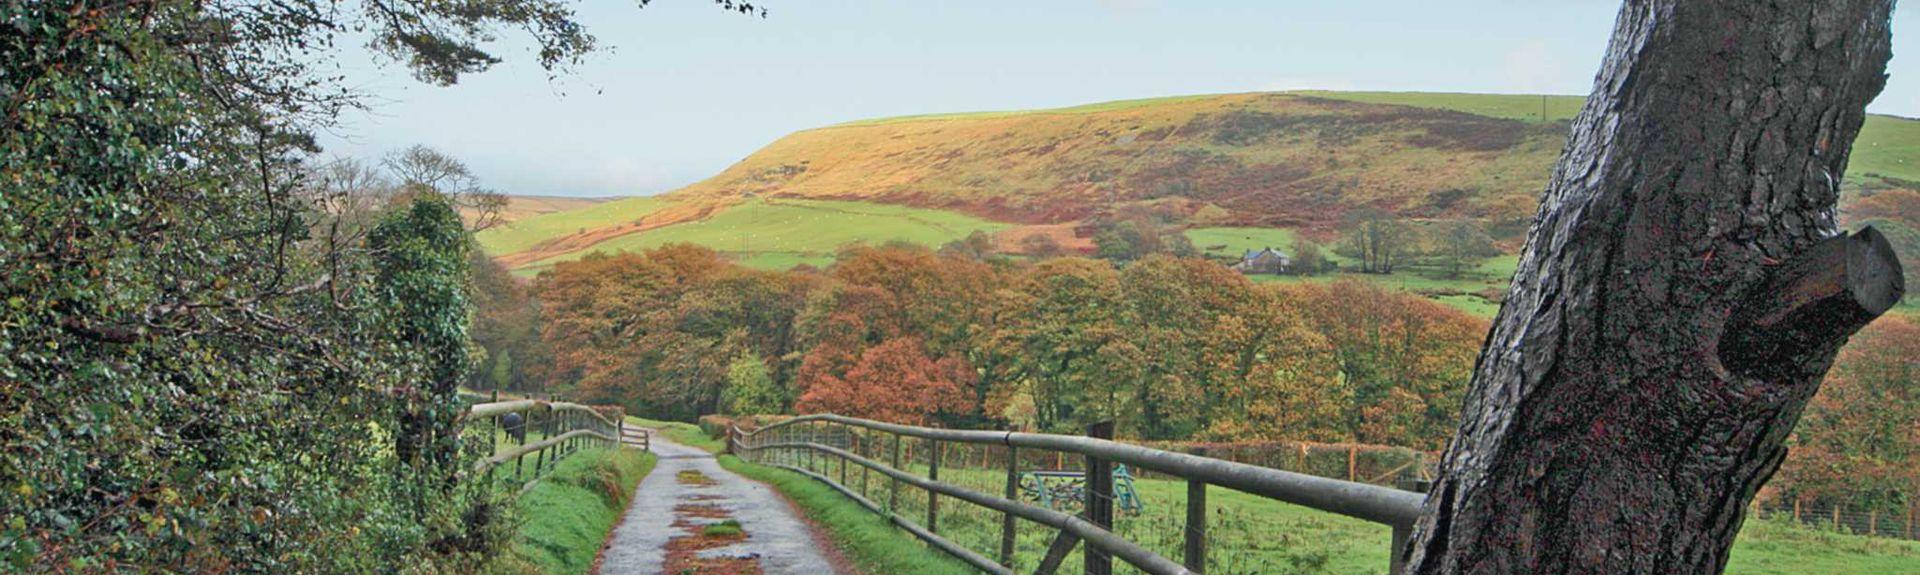 Ferndale, Wales, United Kingdom